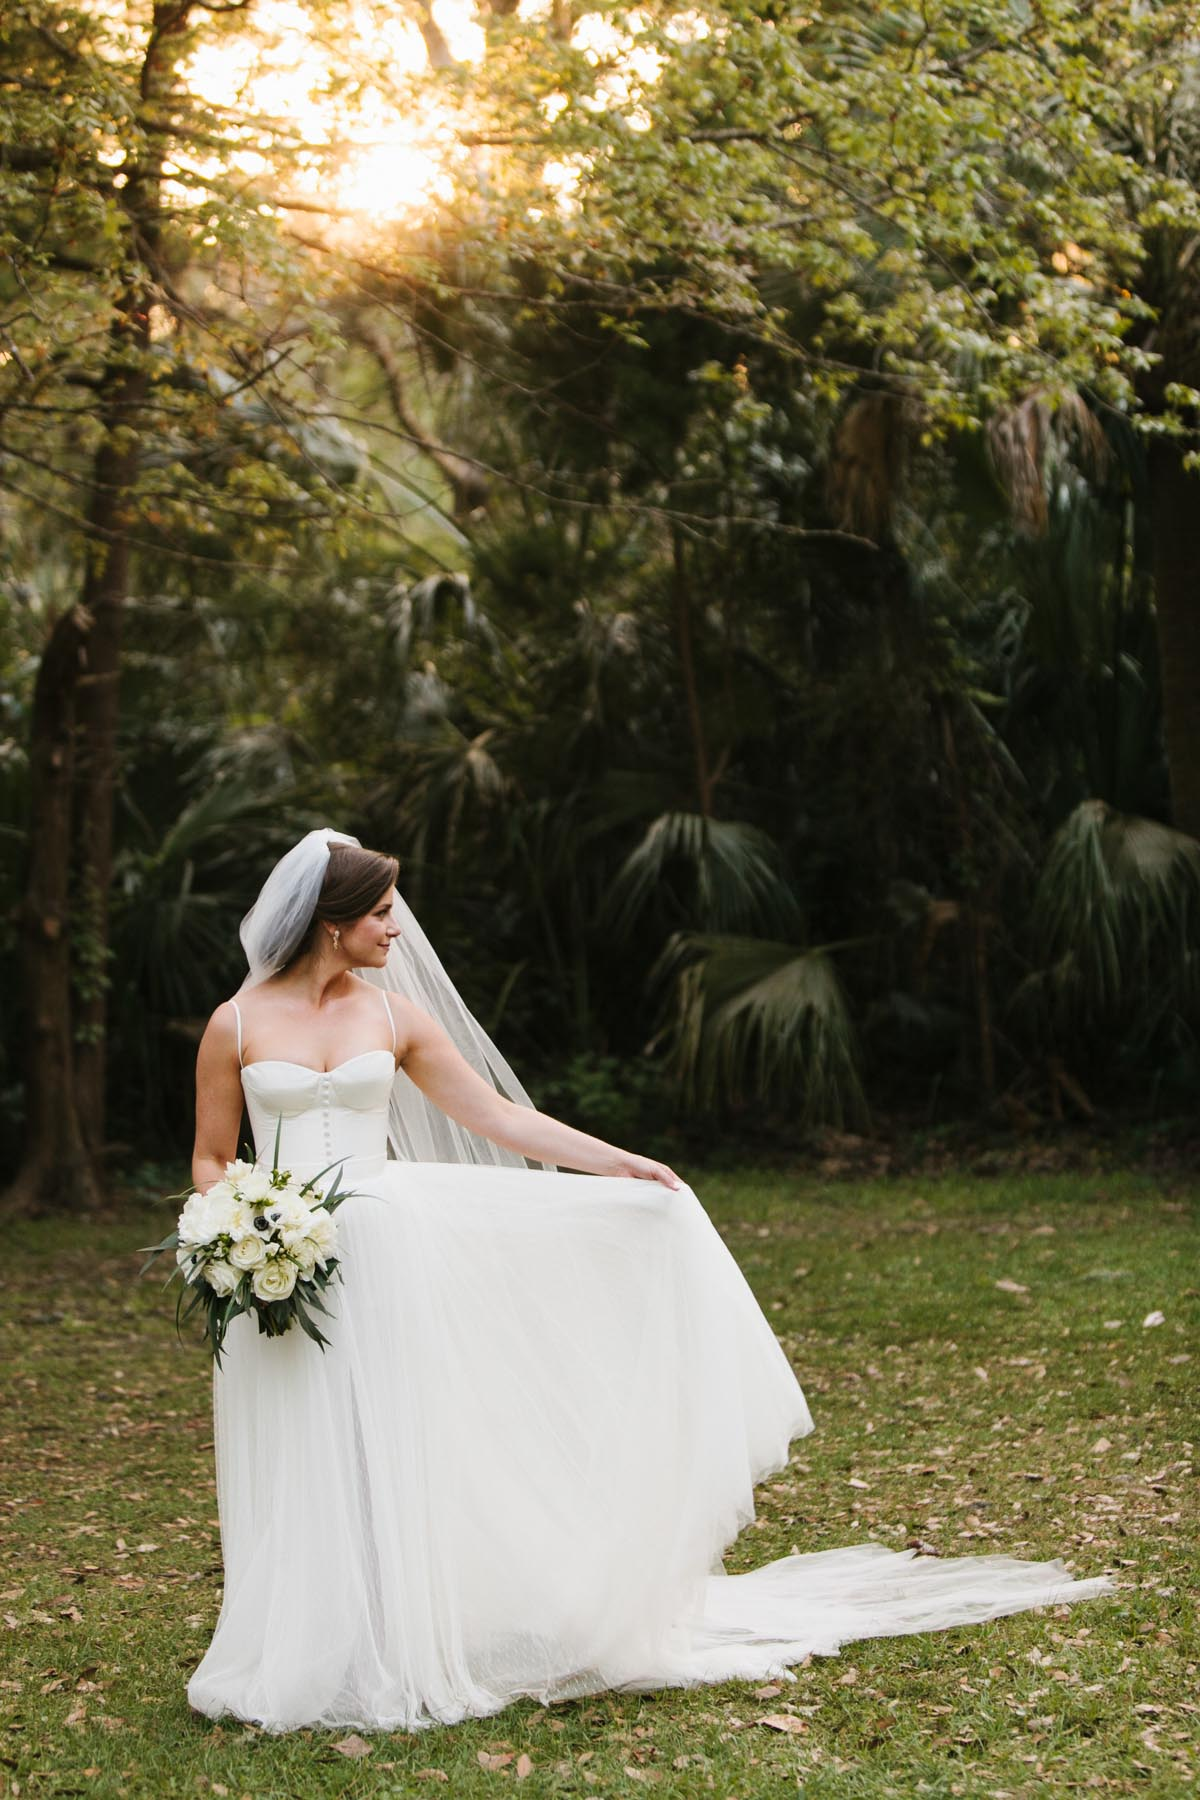 lowry wedding blog eden garden florida wedding-92